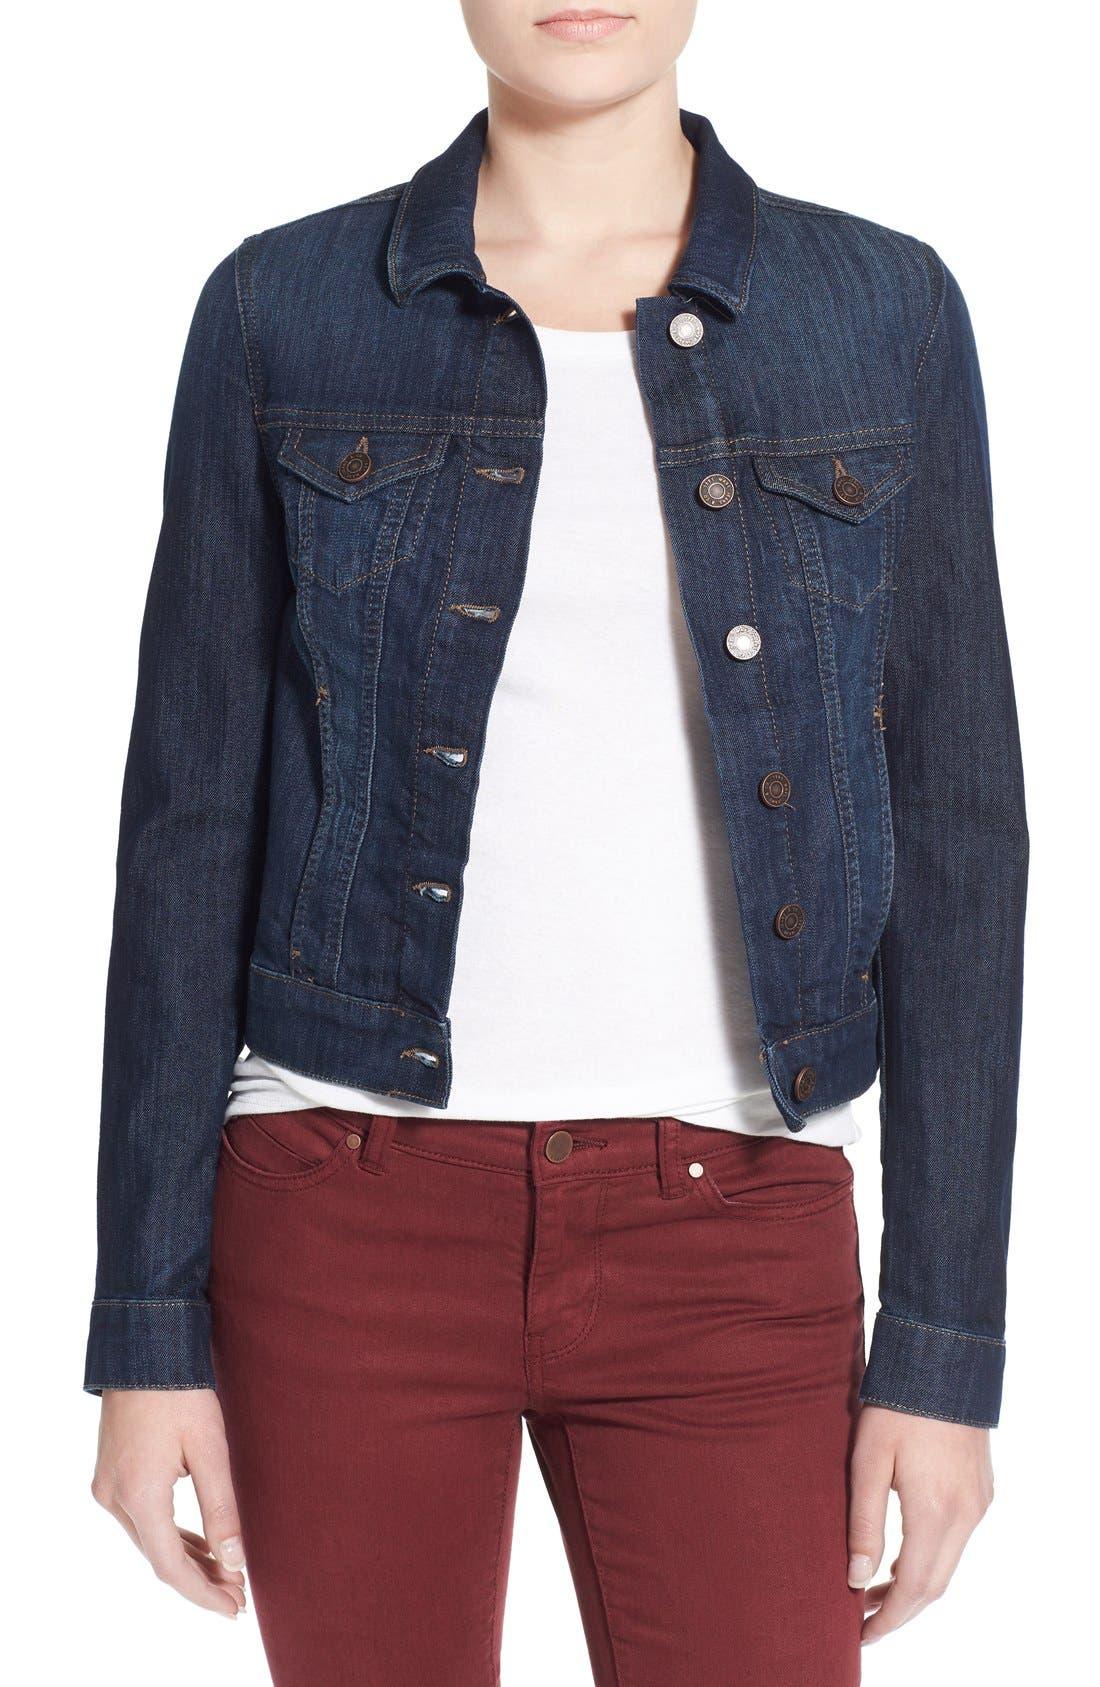 Alternate Image 1 Selected - Mavi Jeans 'Samantha' Denim Jacket